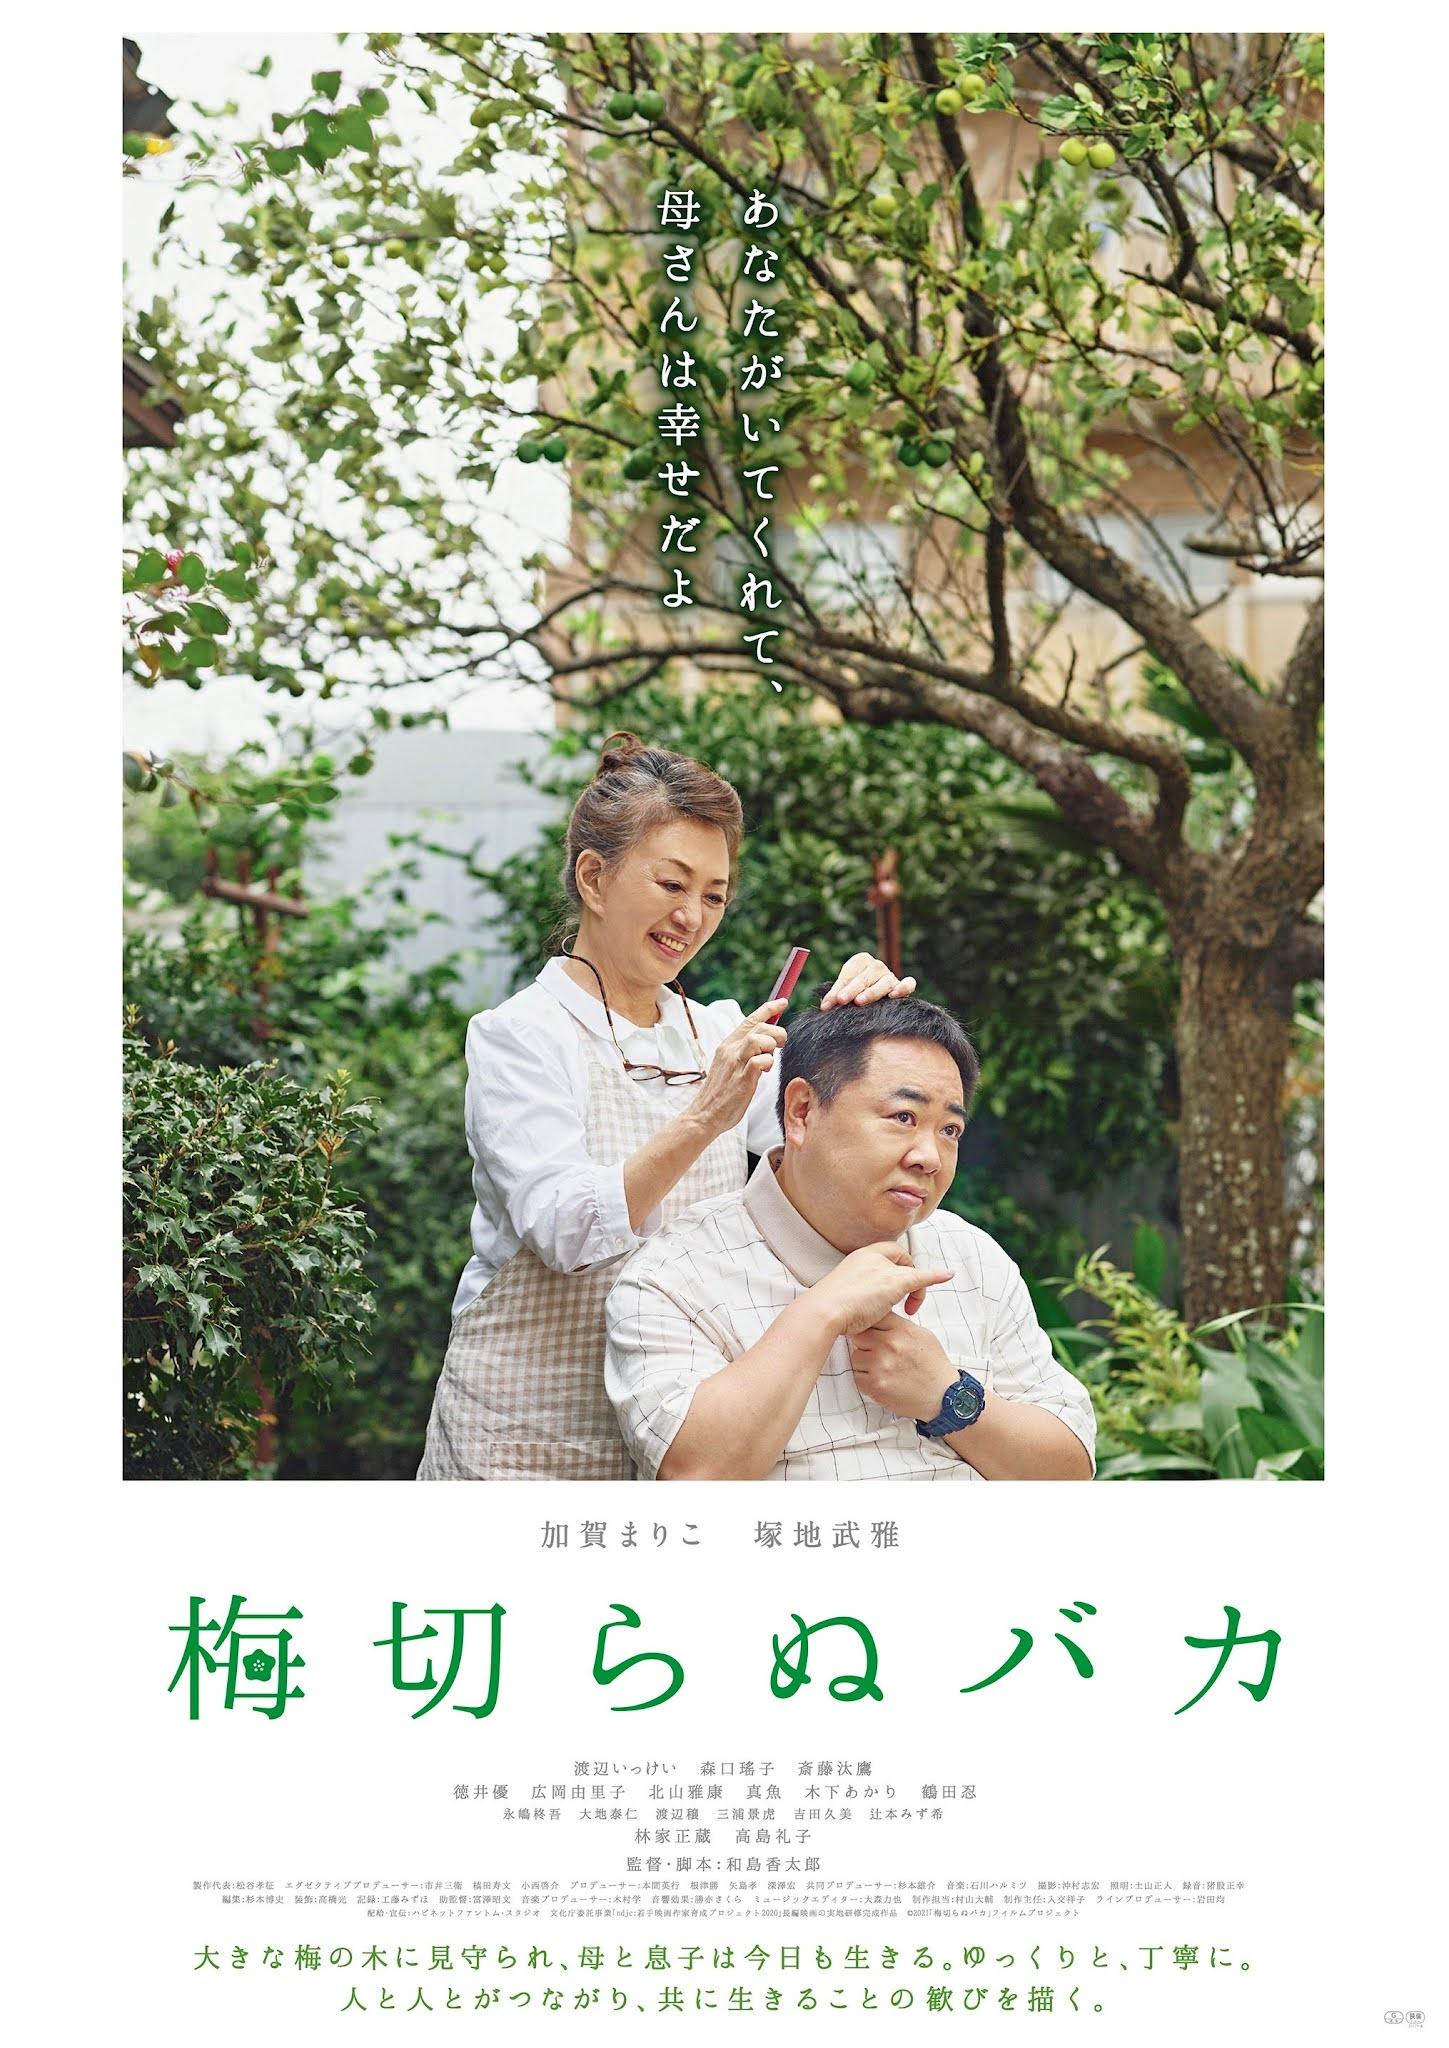 The Lone Ume Tree film - Kotaro Wajima - poster